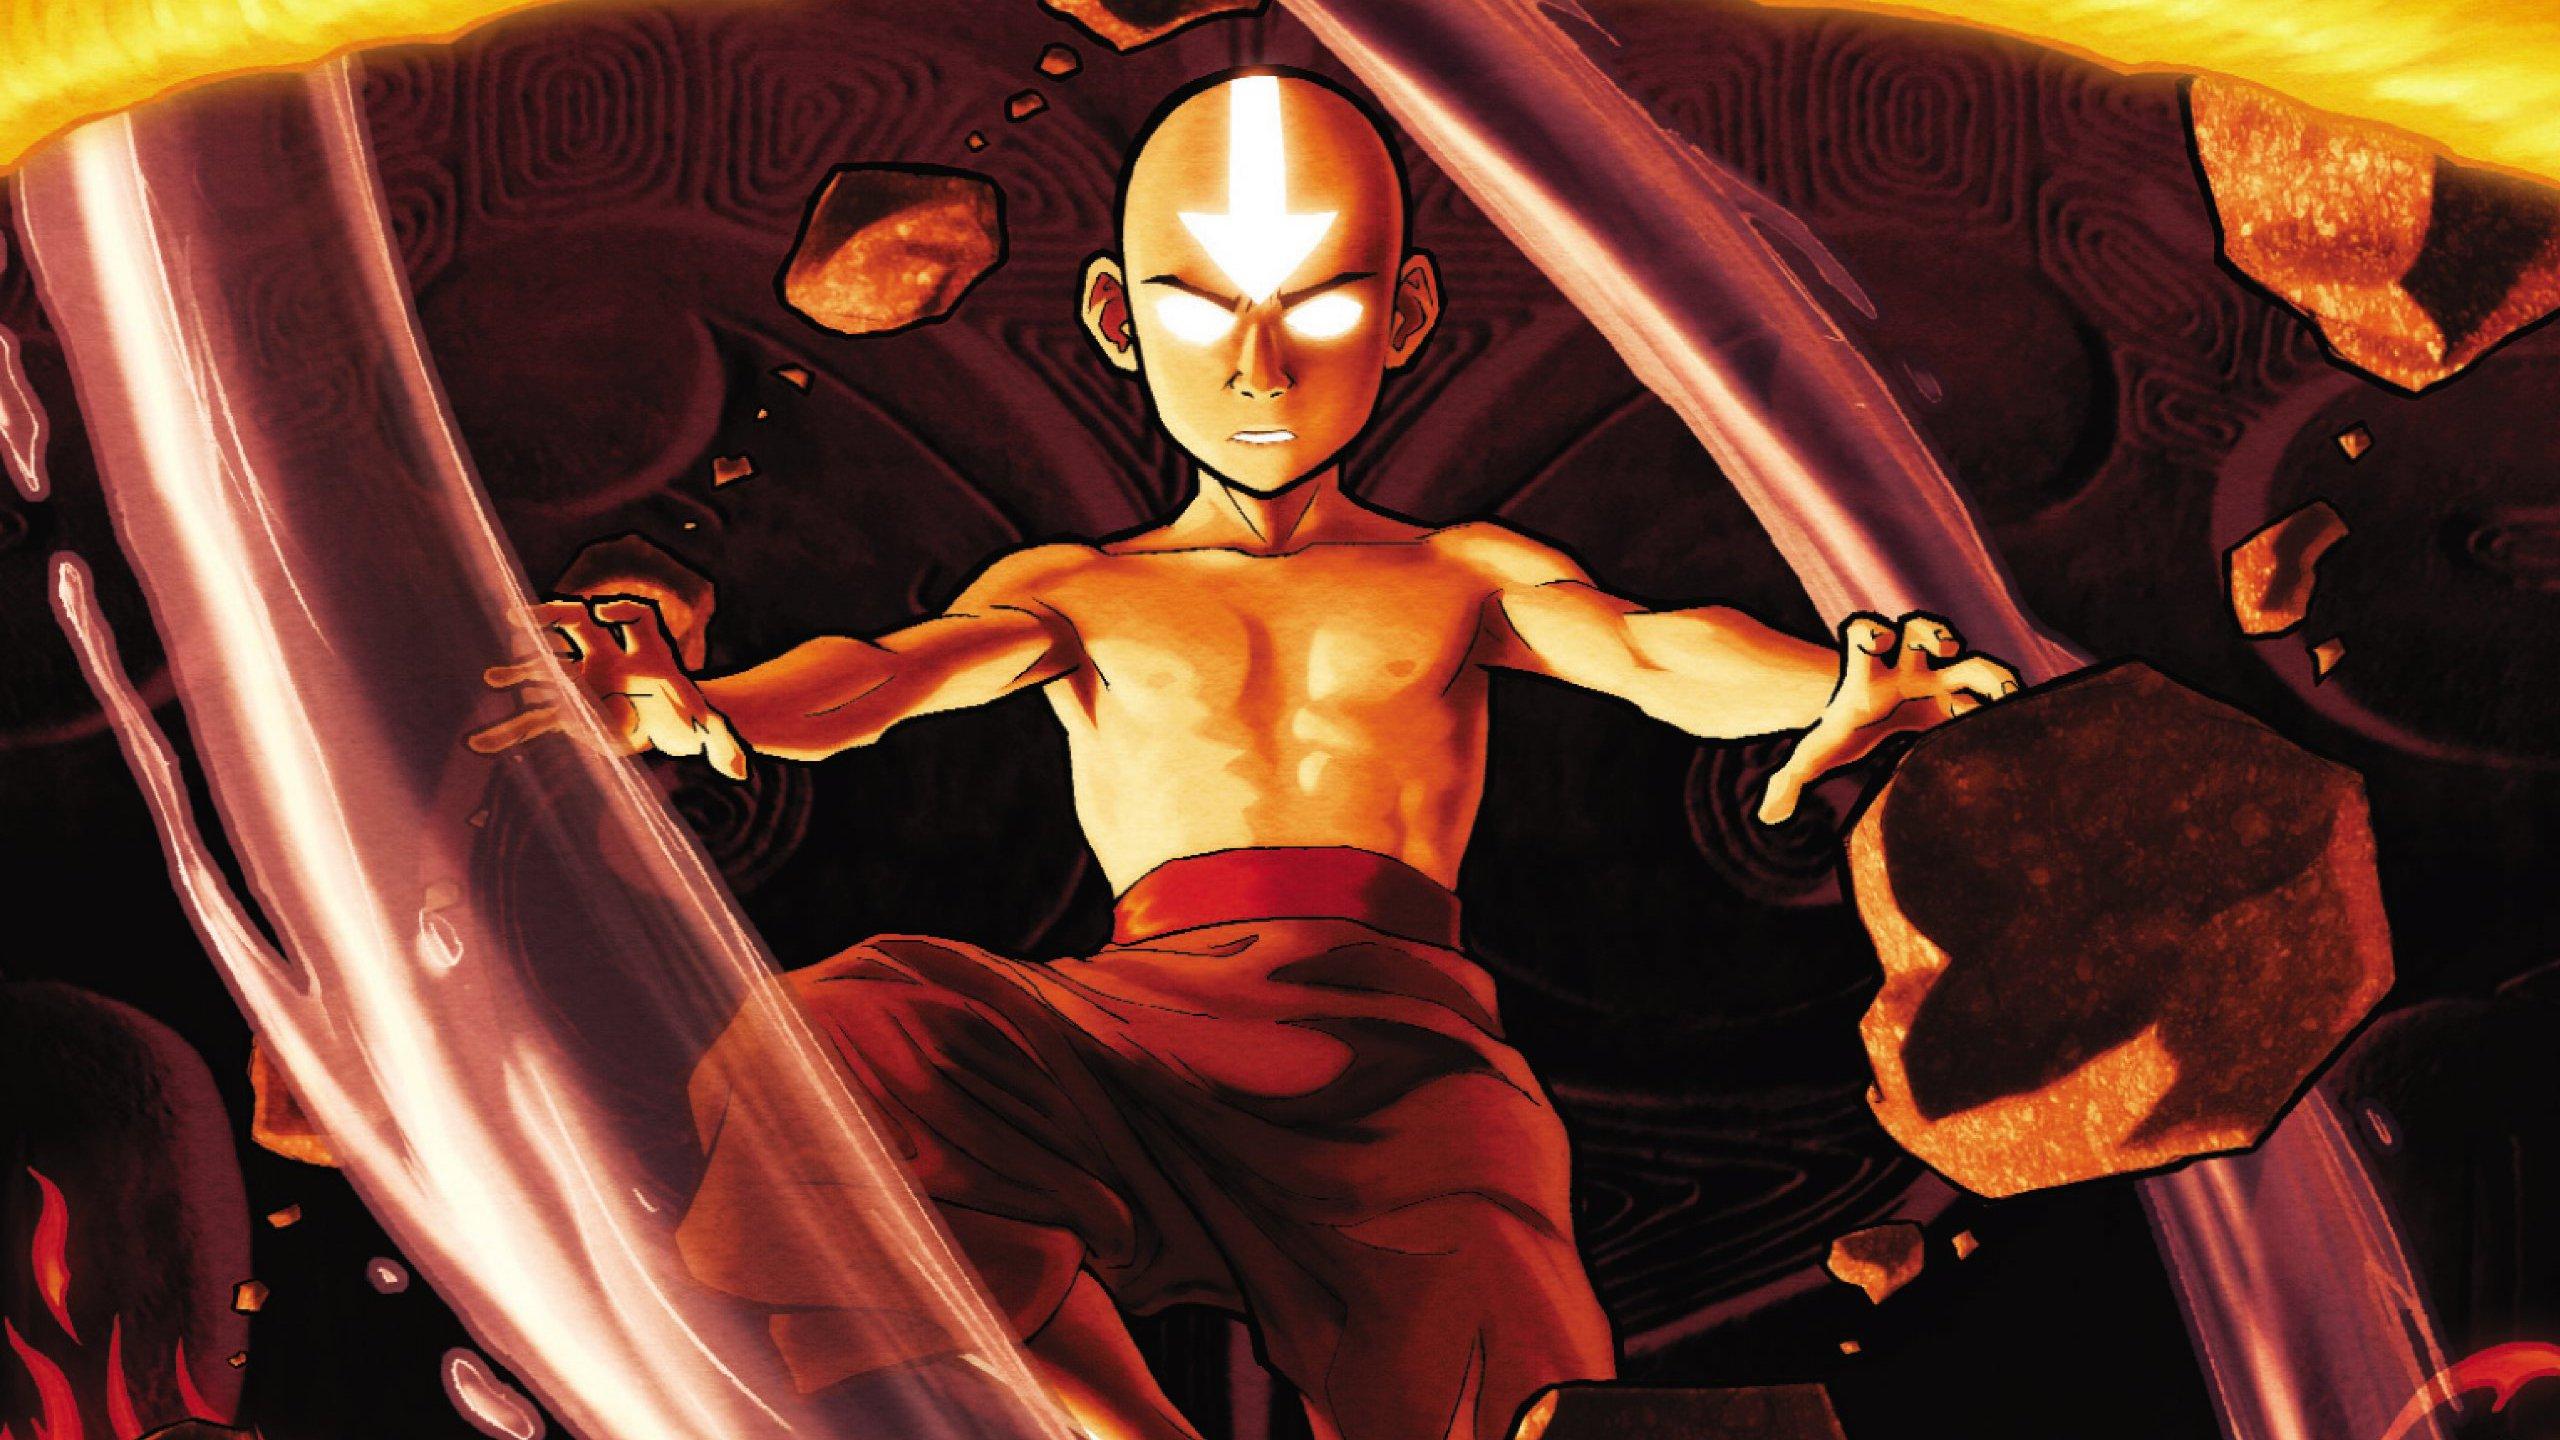 Avatar The Last Airbender Aang Wallpapers Hd Desktop And